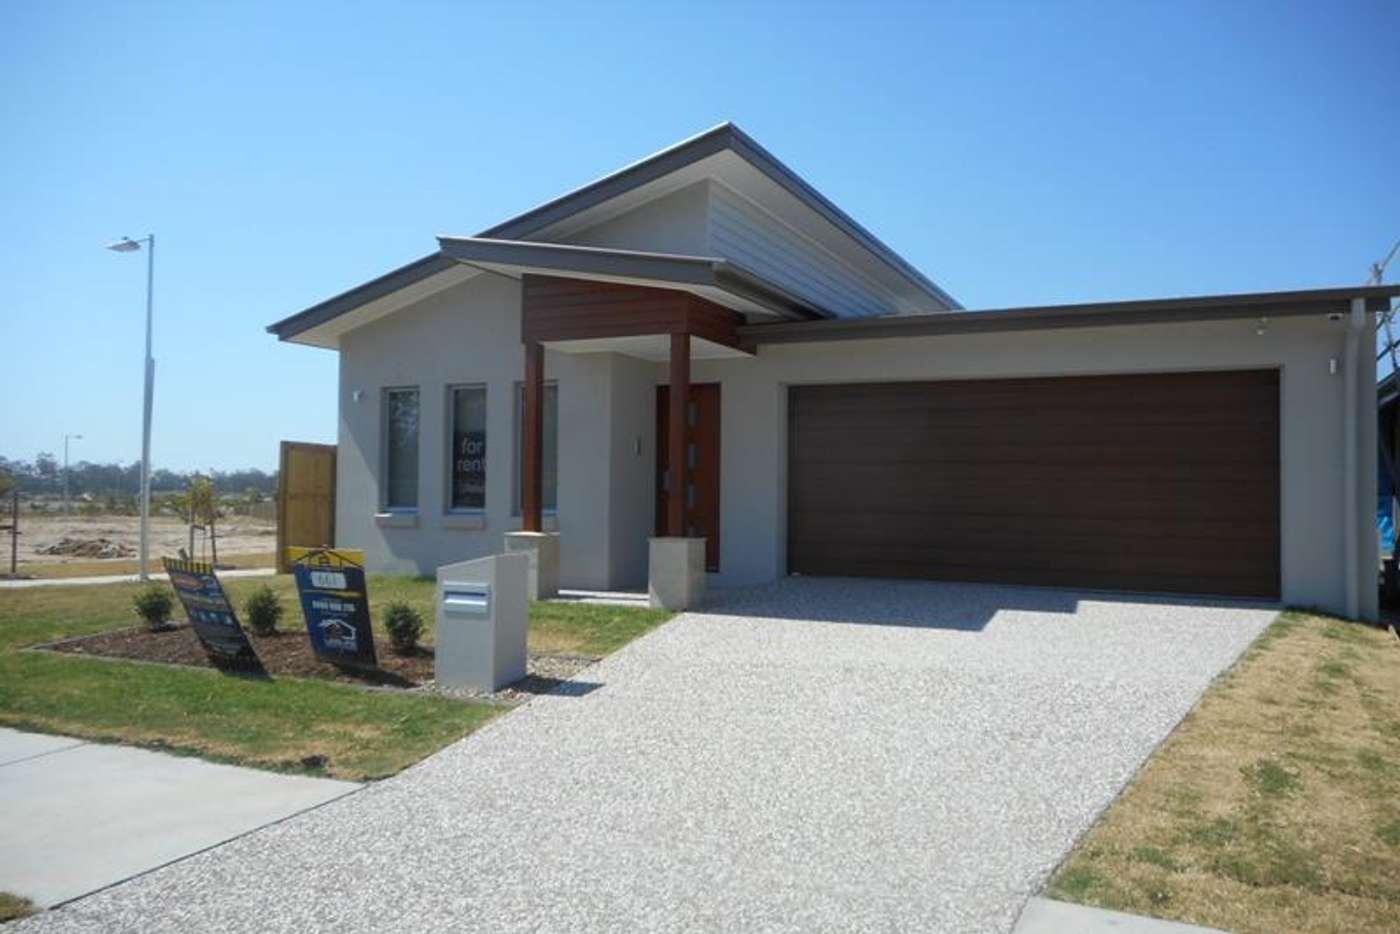 Main view of Homely house listing, 48 Darlington Drive, Yarrabilba QLD 4207